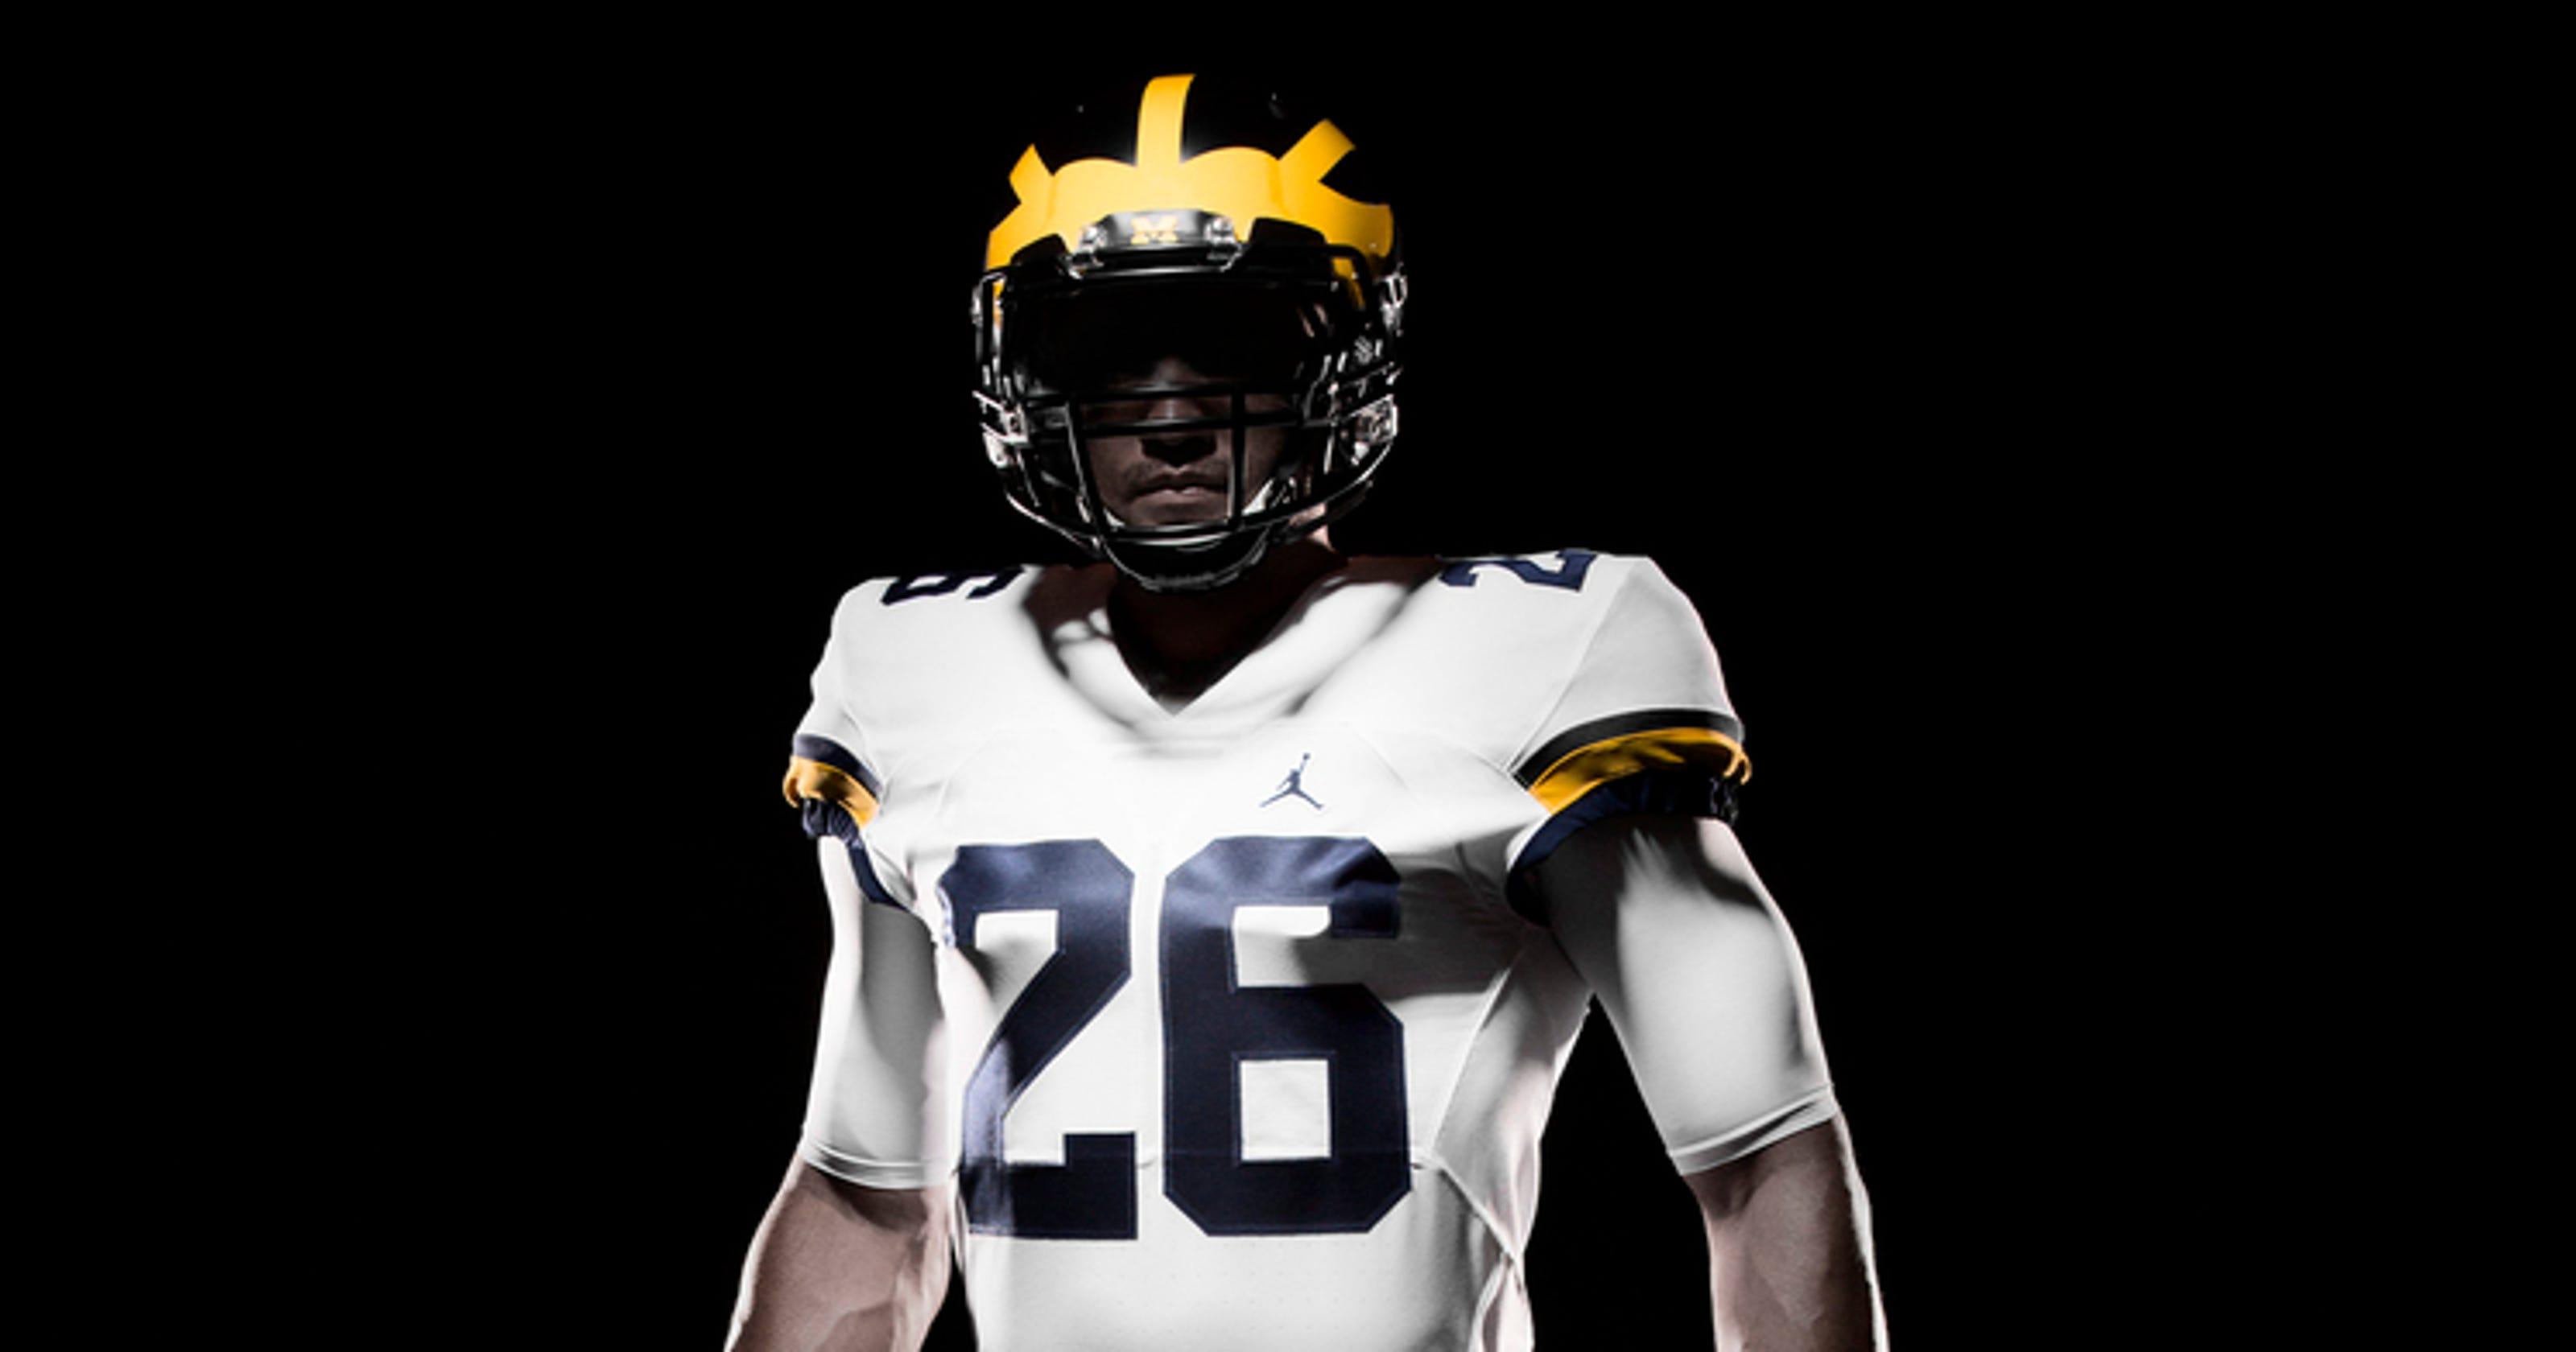 25f2a322cda3 Check it out  New Michigan football uniform revealed